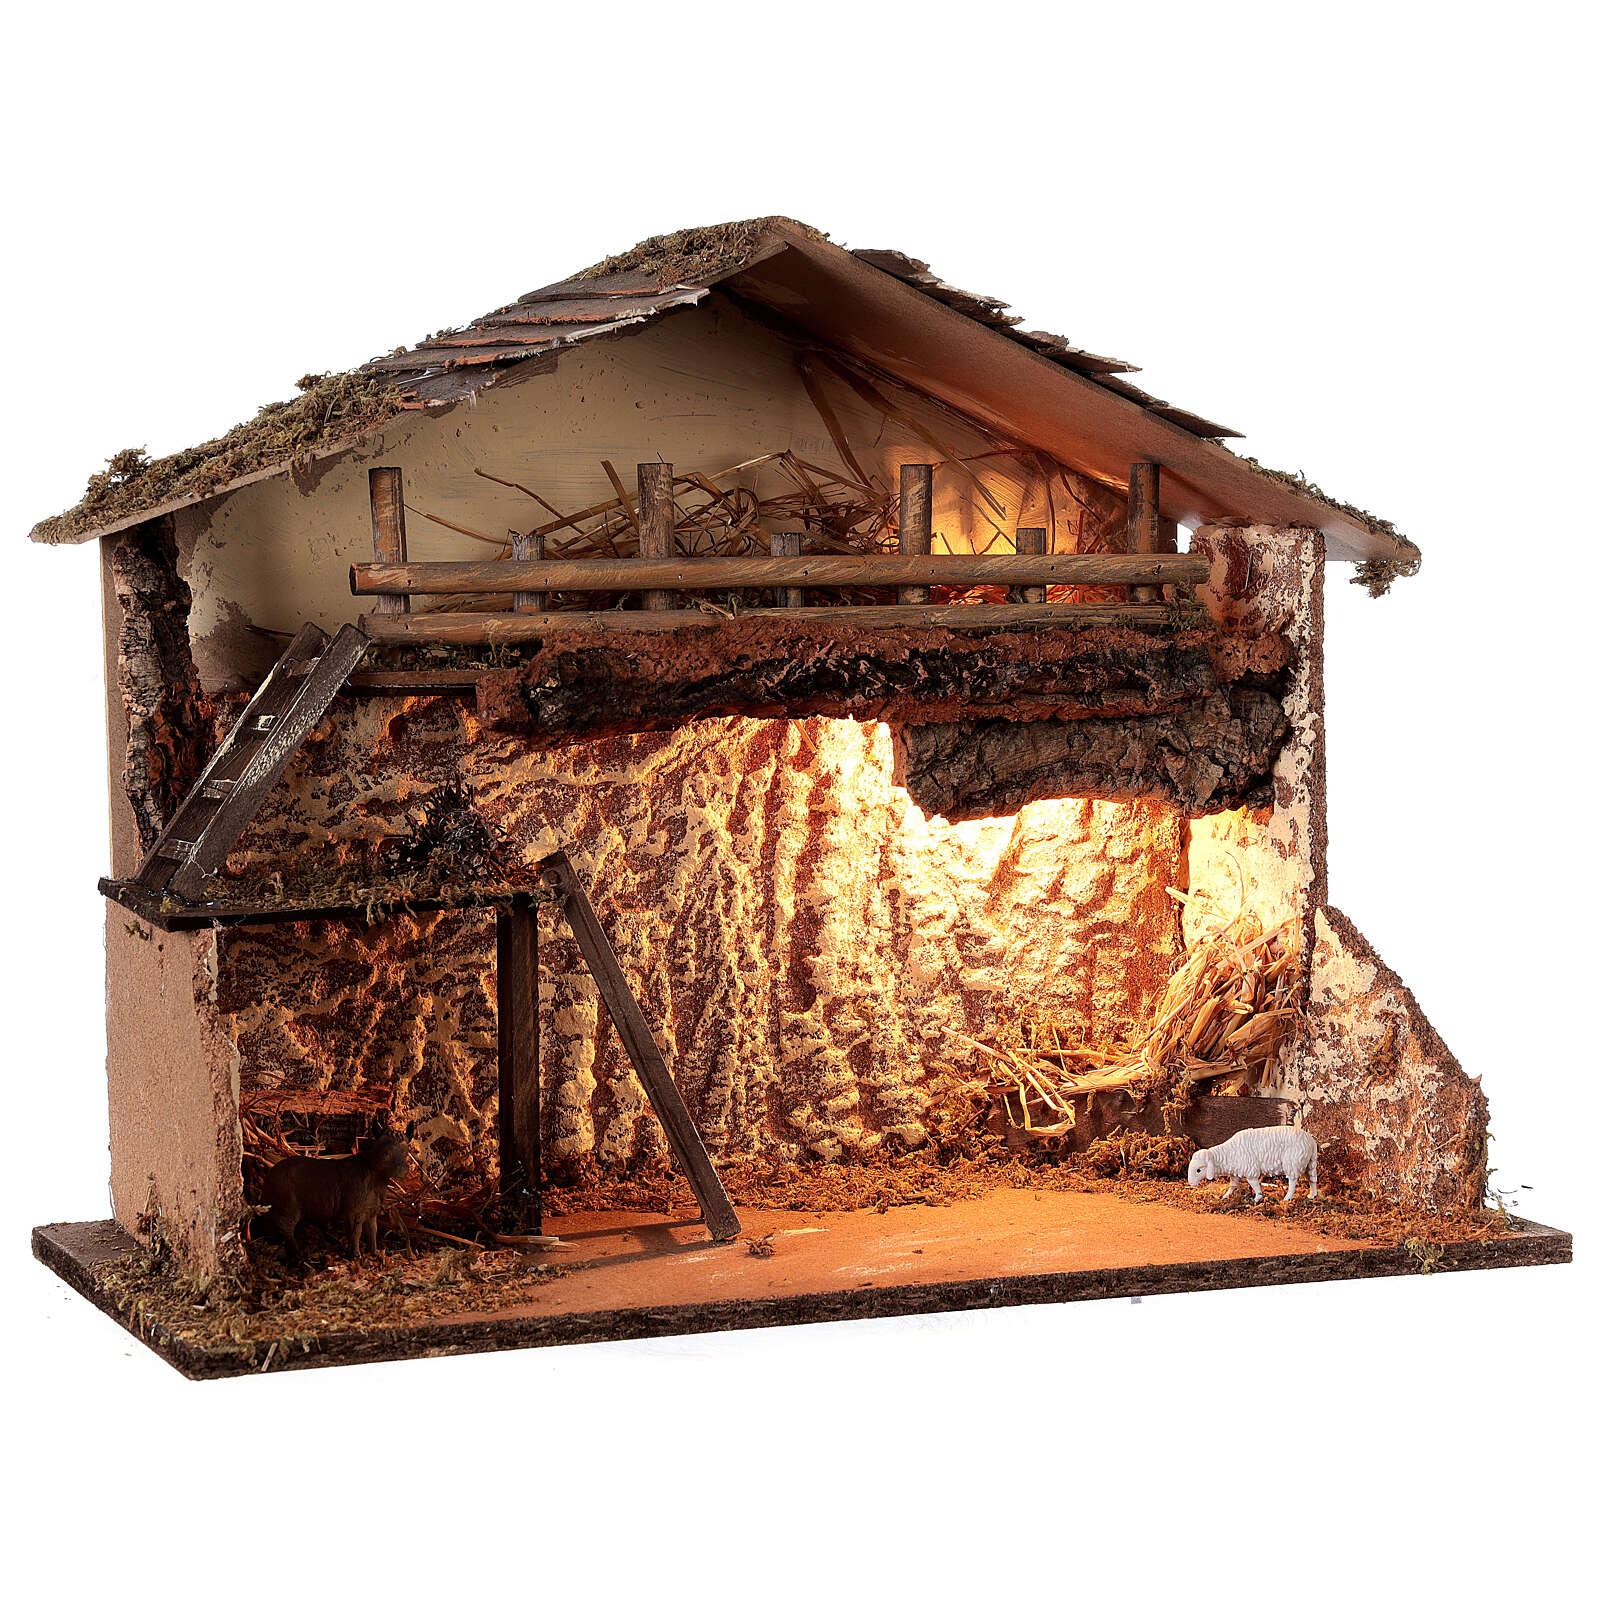 Cabaña iluminada 35x50x25 cm belén nórdico 12-14 cm 4